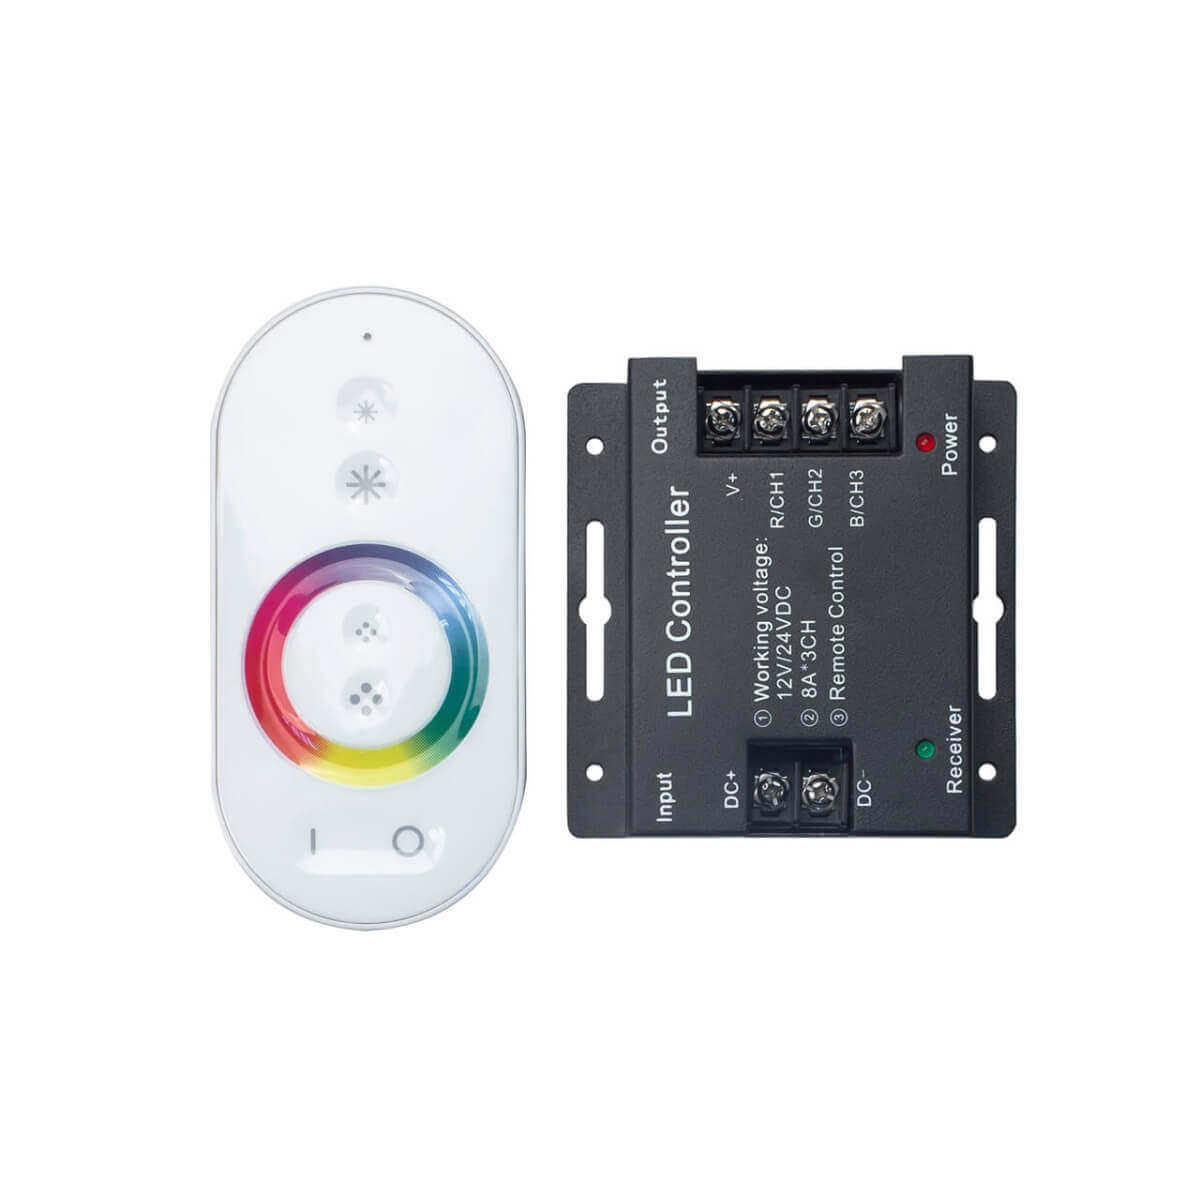 Контроллер Gauss для светодиодной ленты RGB 201013288 arlight контроллер для светодиодной ленты arlight 020329